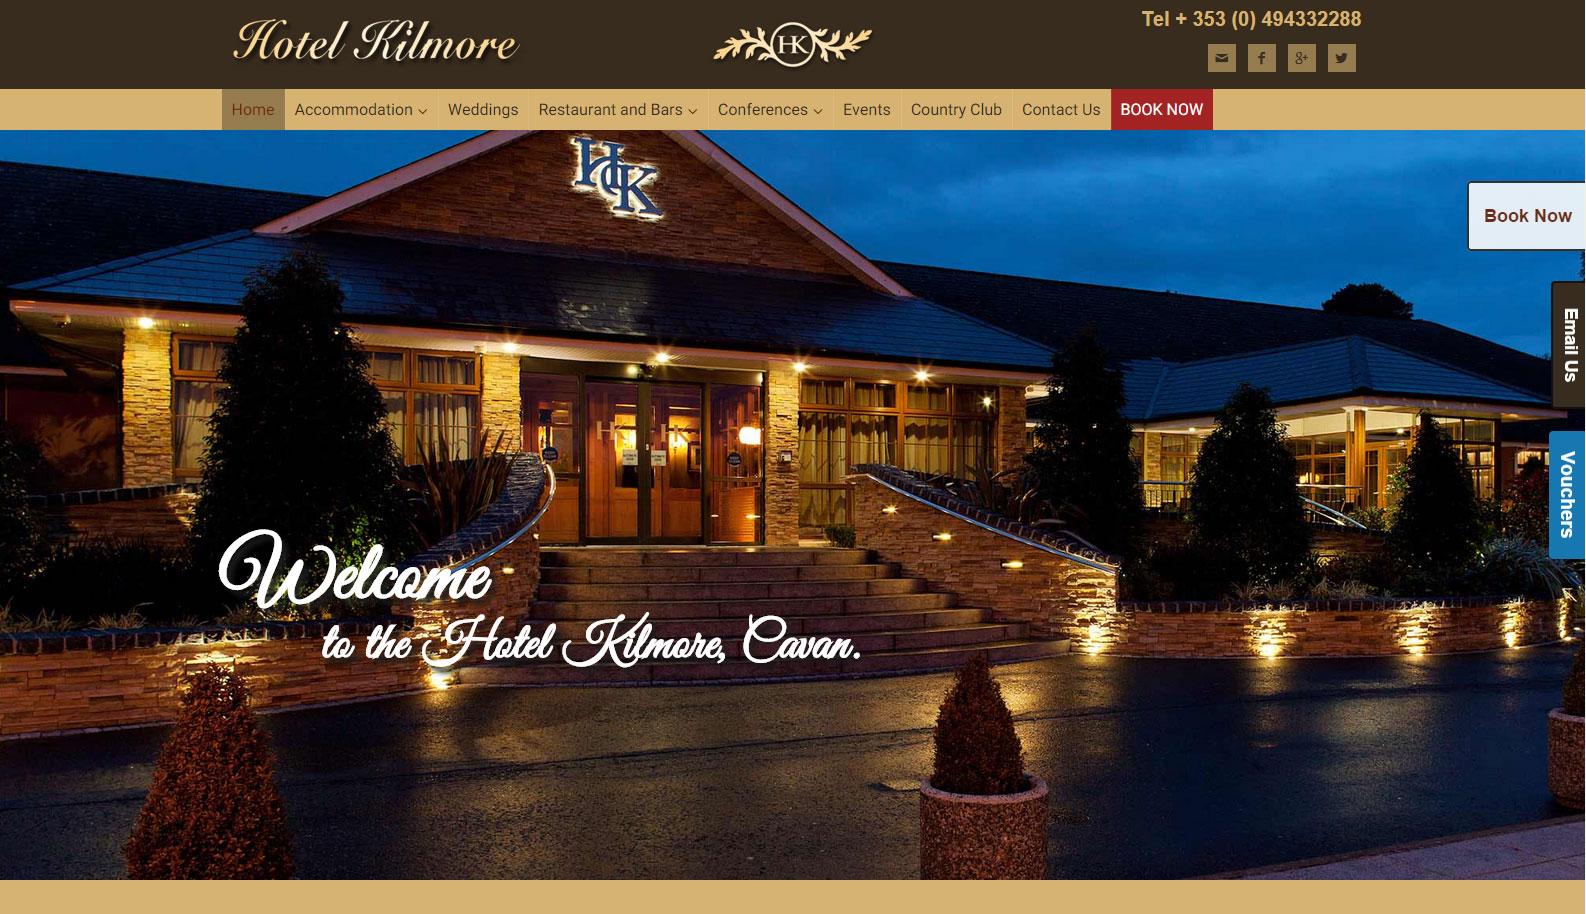 Hotel kilmore cavan mobile responsive redesign website for Design hotels 2015